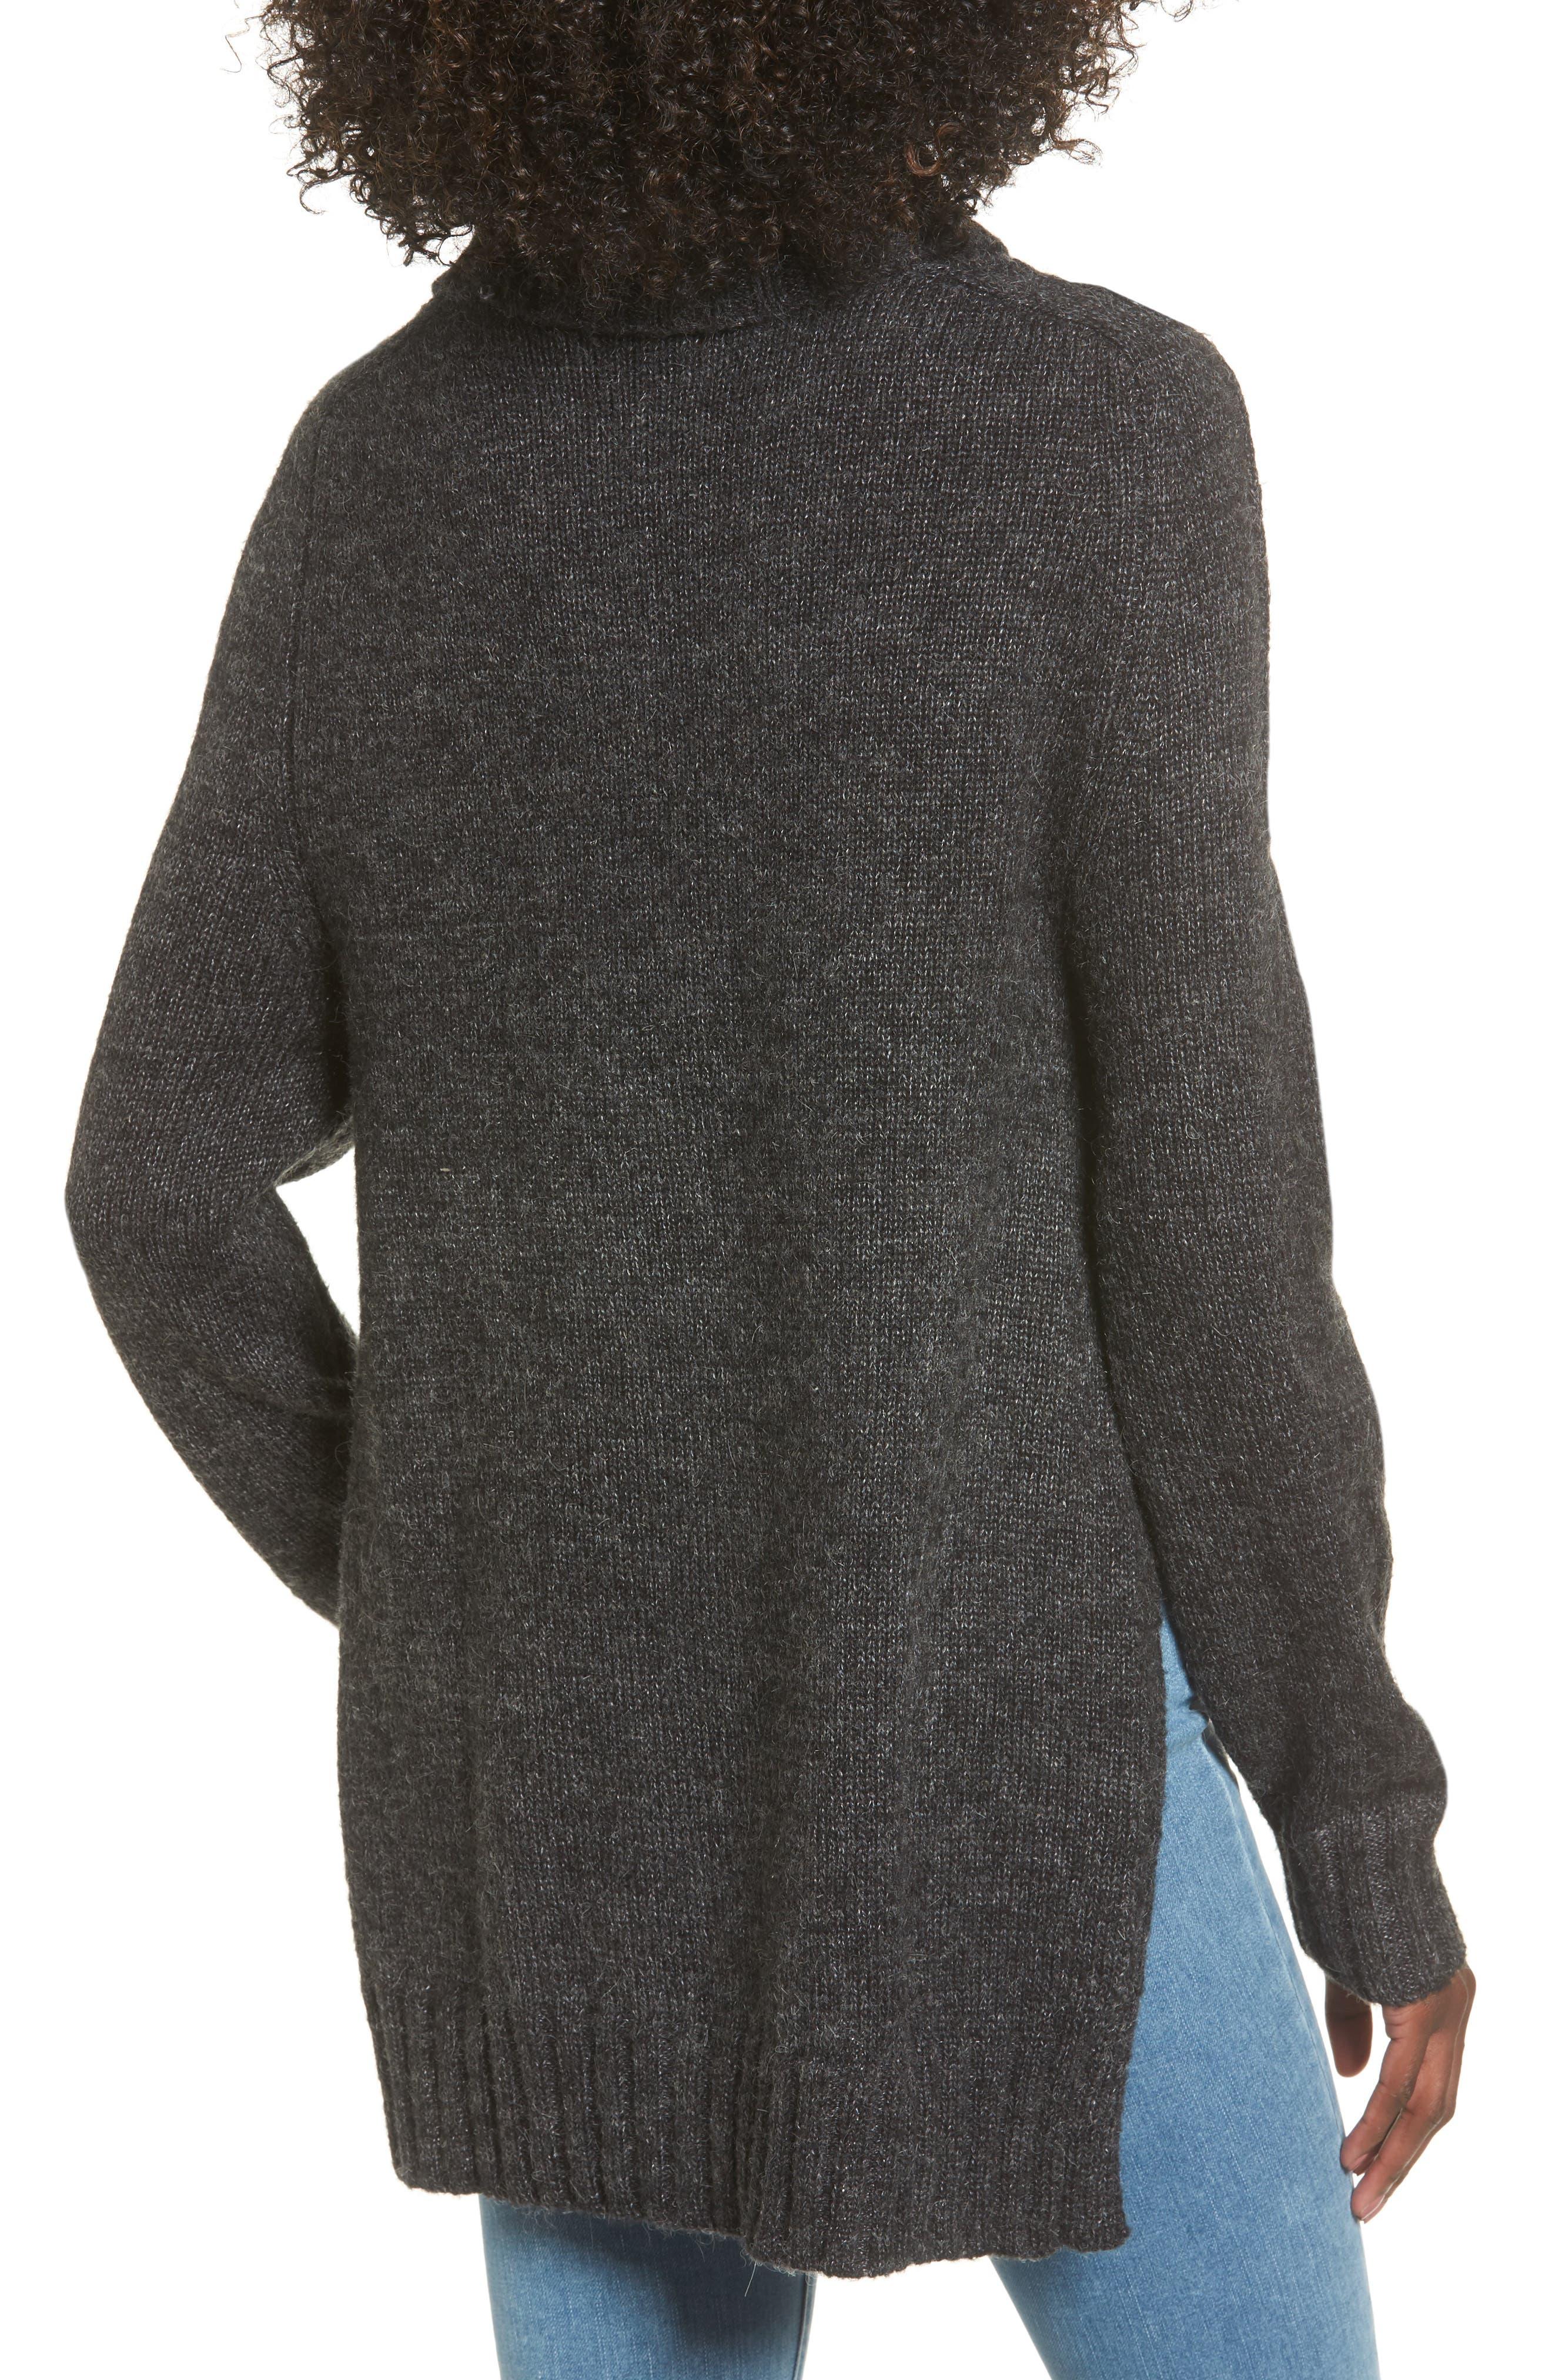 Alternate Image 2  - ASTR the Label Stacy Turtleneck Sweater